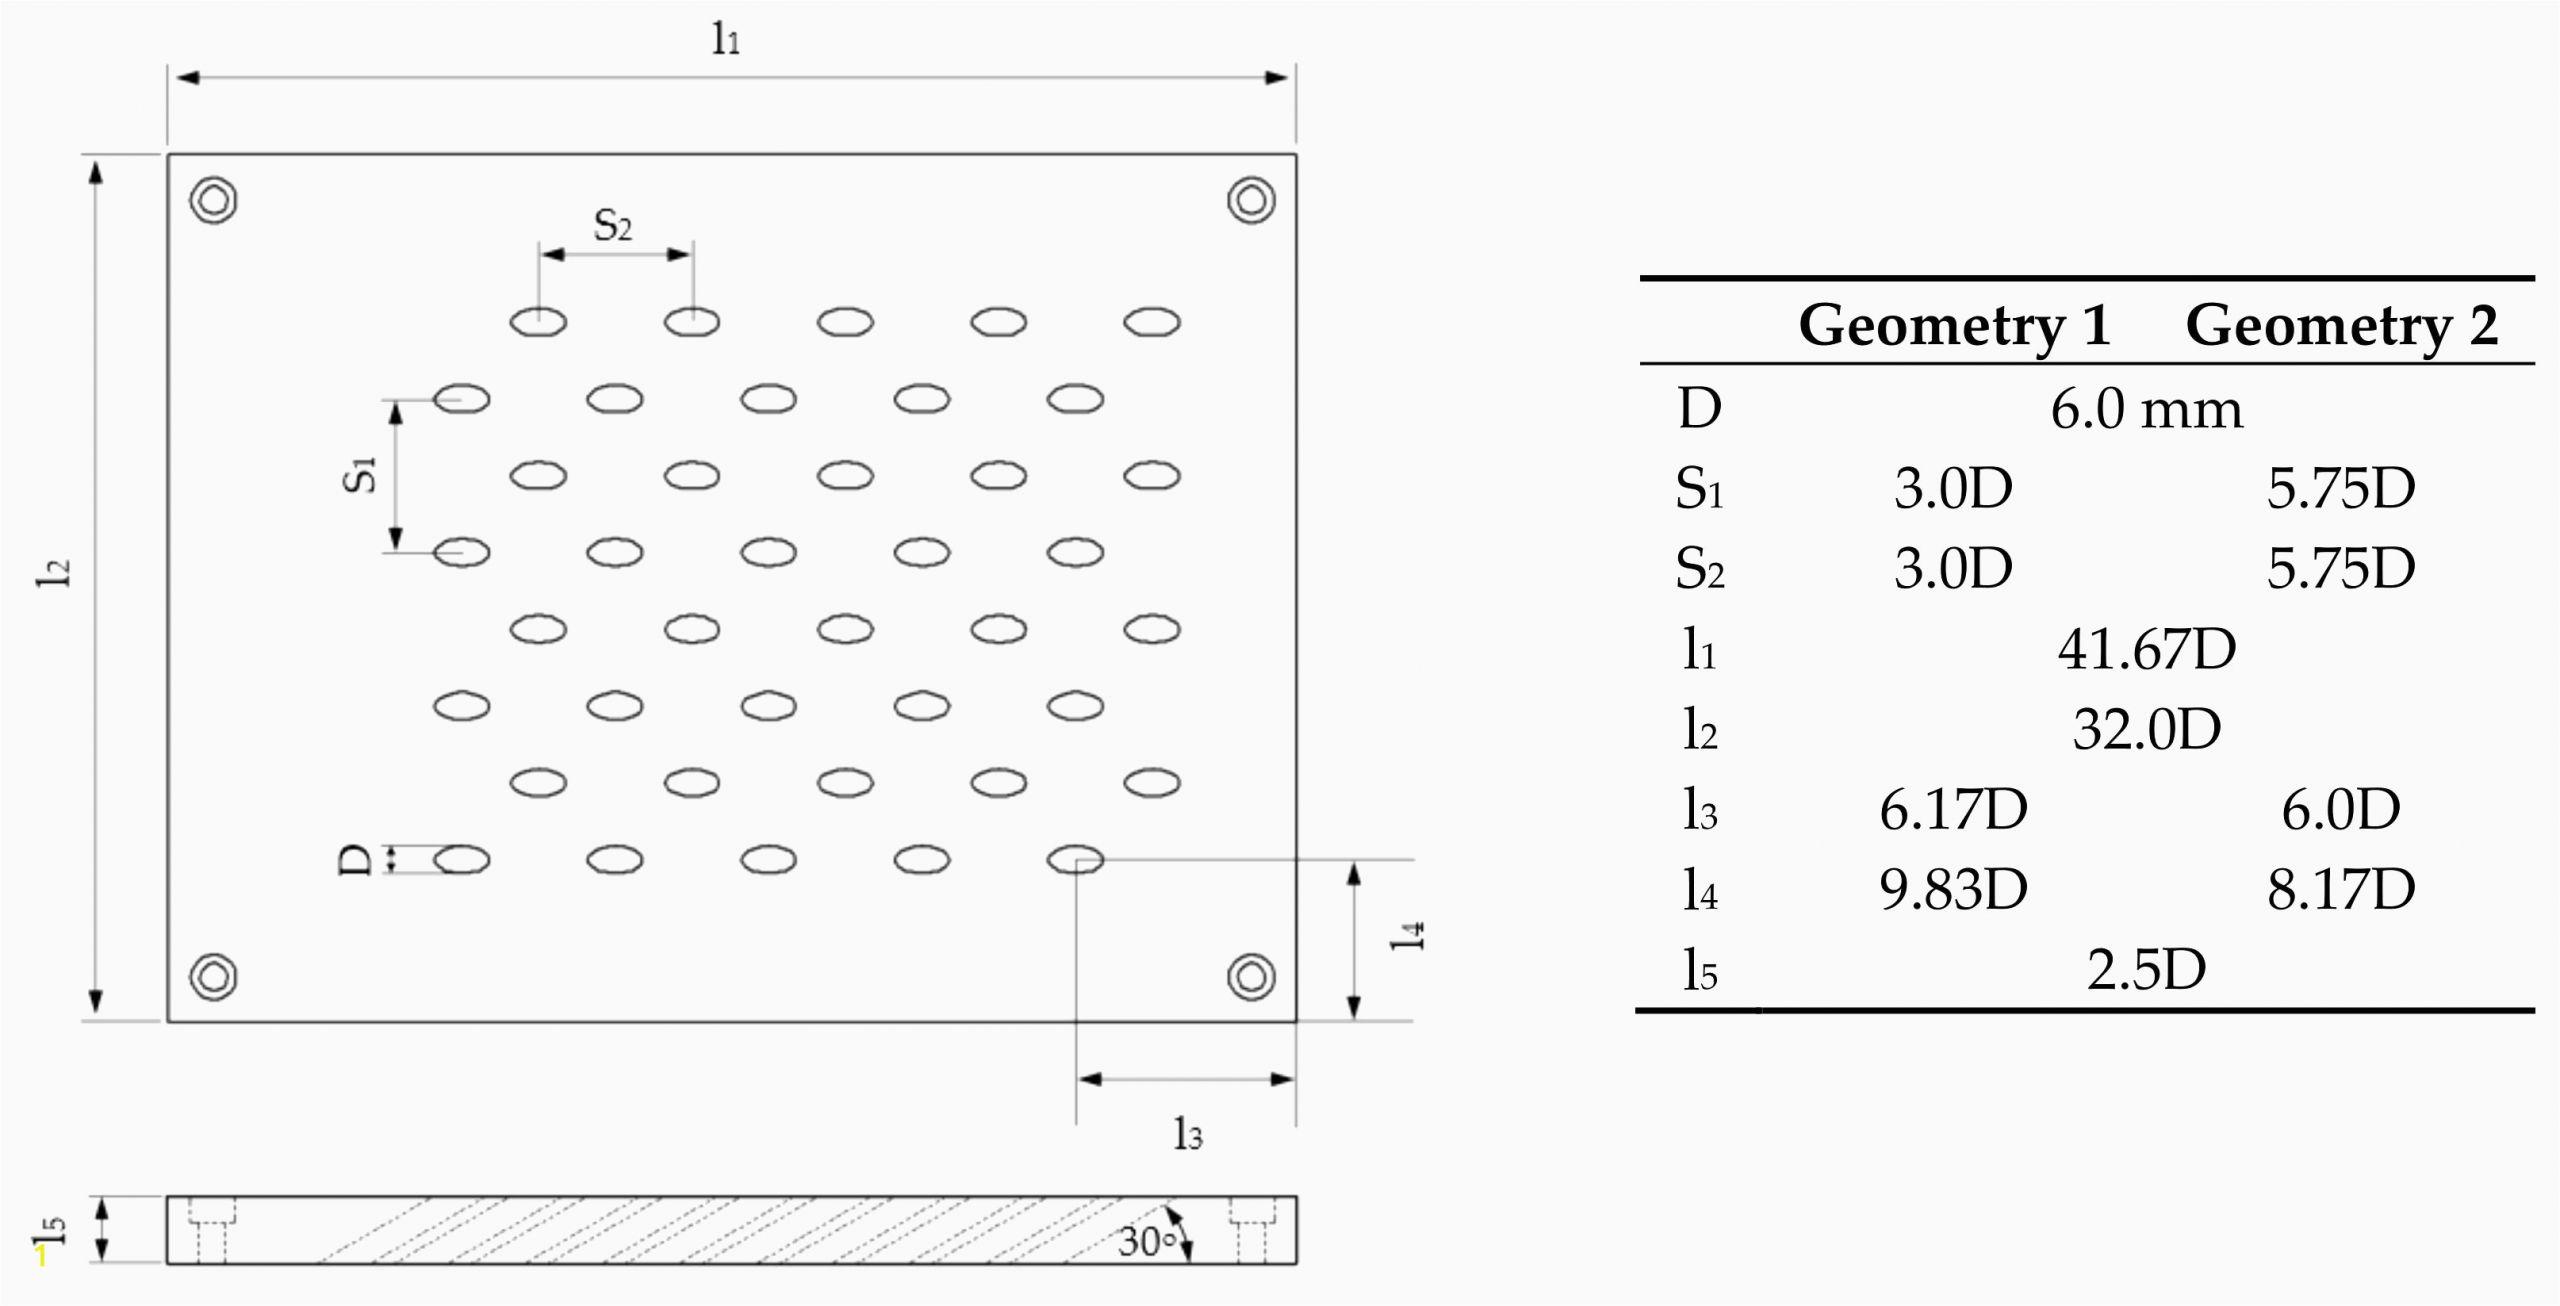 minecraft bilder zum ausdrucken frisch star wars pixel art templates star perler bead template free cover of minecraft bilder zum ausdrucken